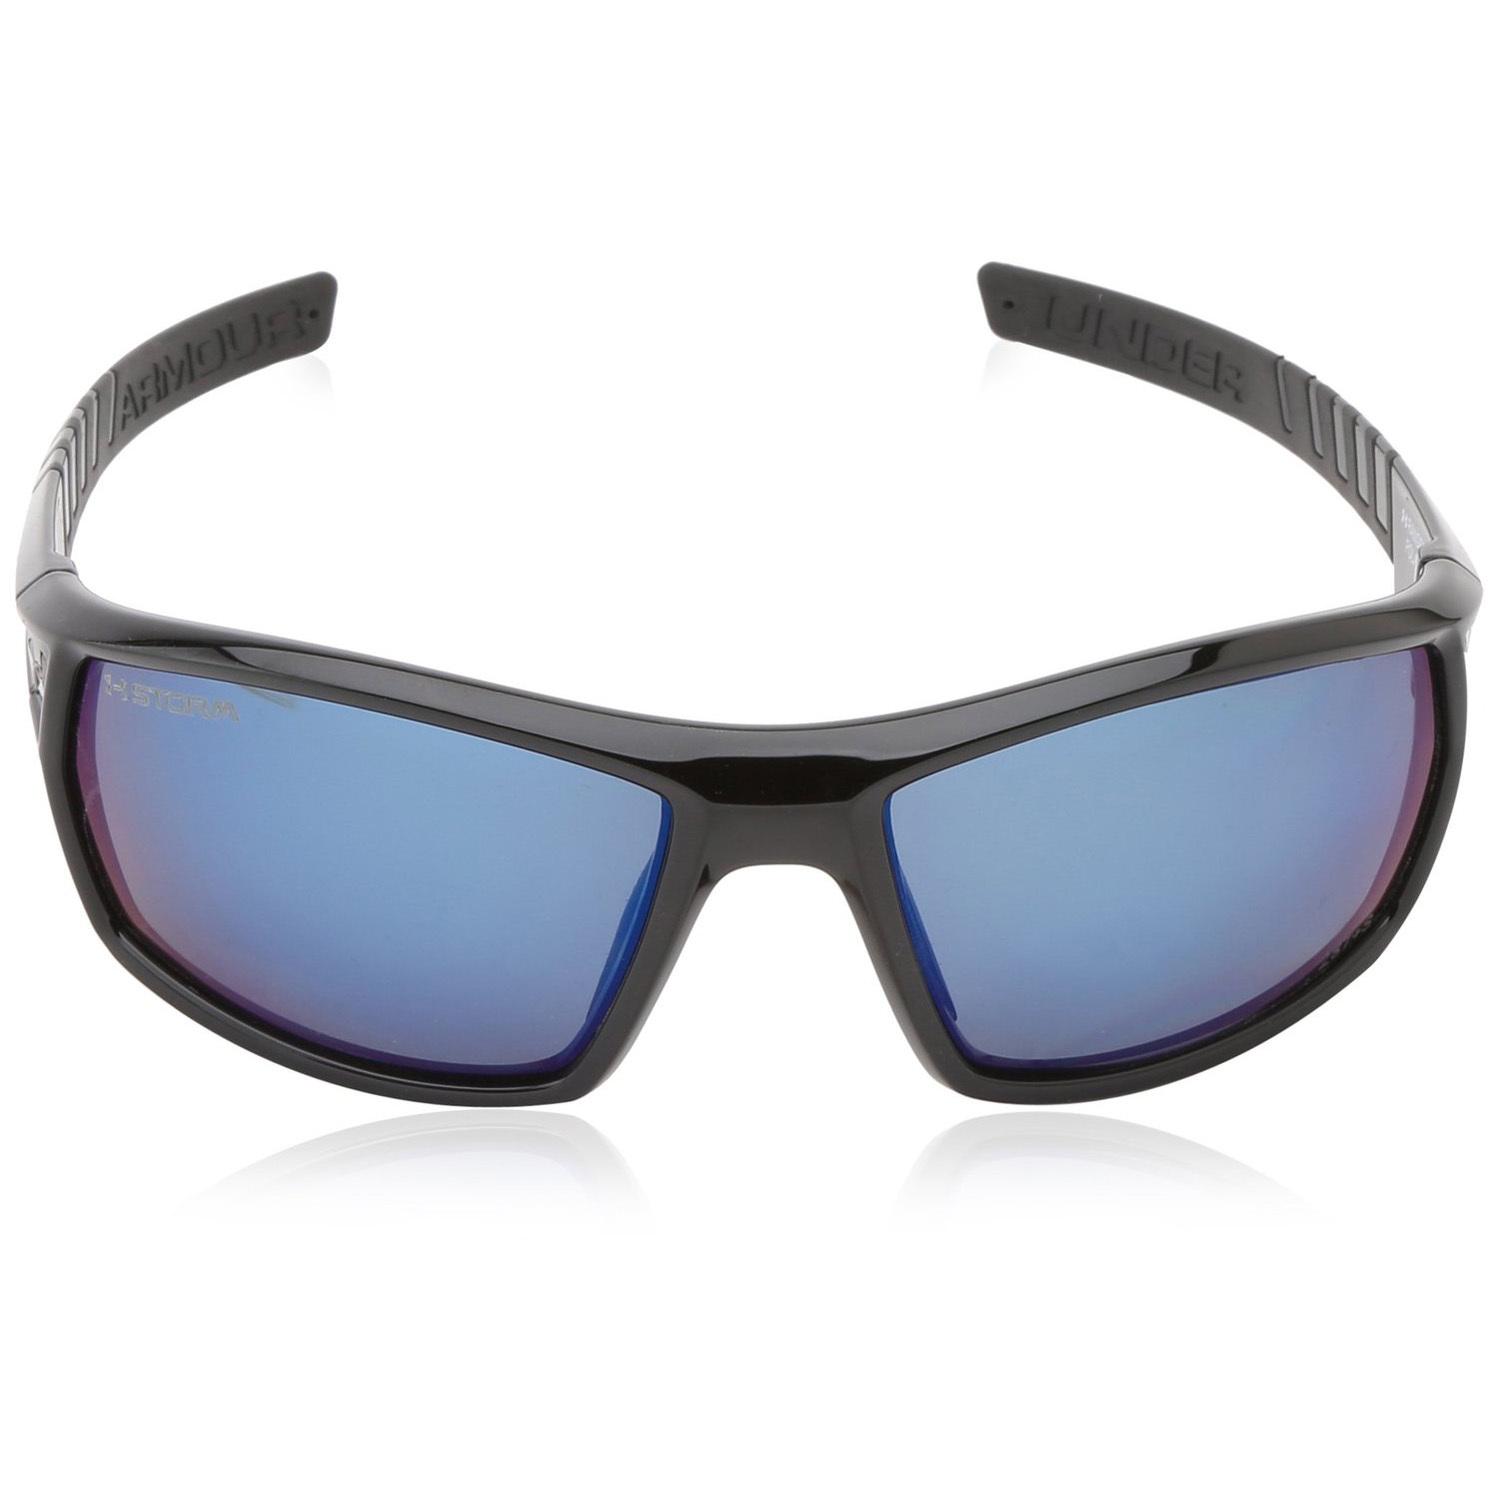 Under Armour UA Ranger Sunglasses Black Frame Blue Mirror ...